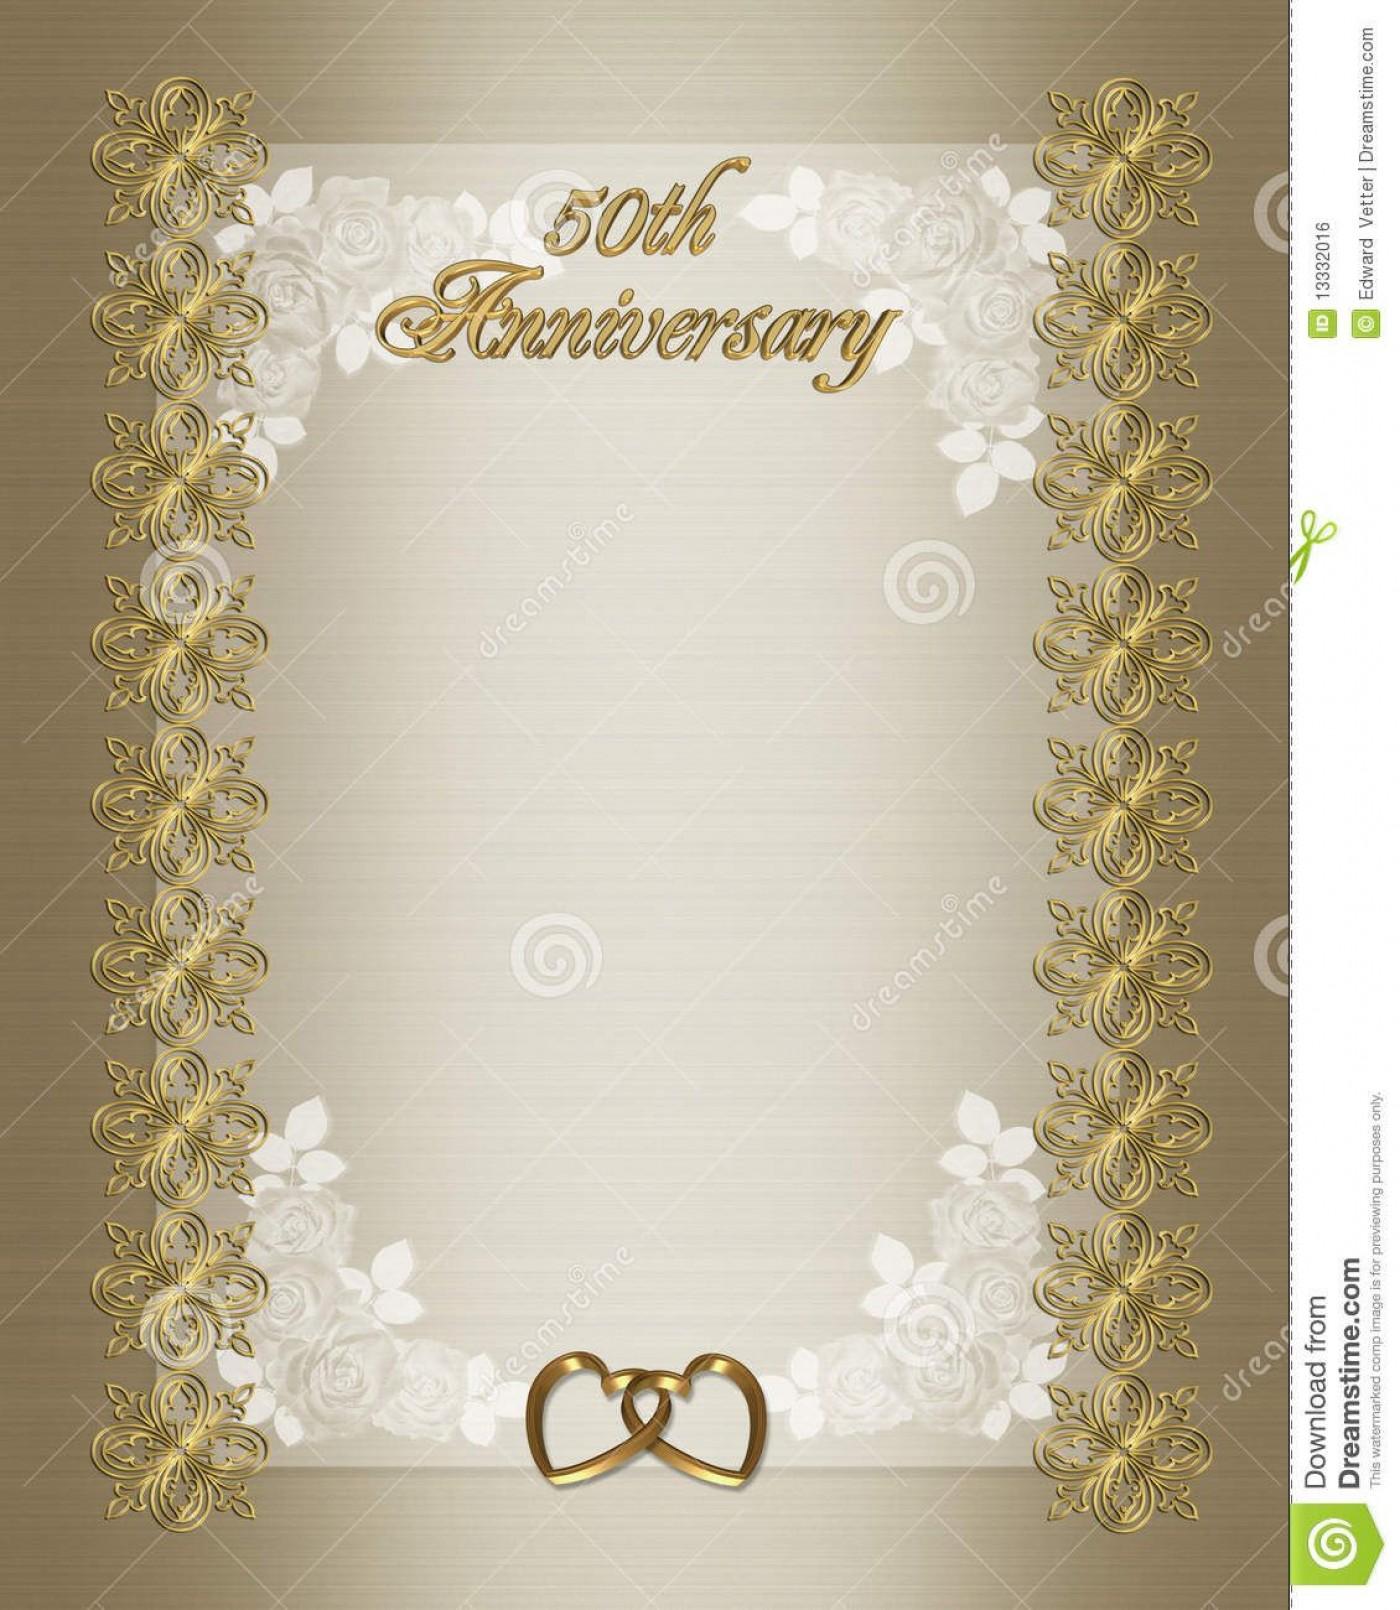 006 Wondrou Free Printable 50th Wedding Anniversary Invitation Template Design 1400